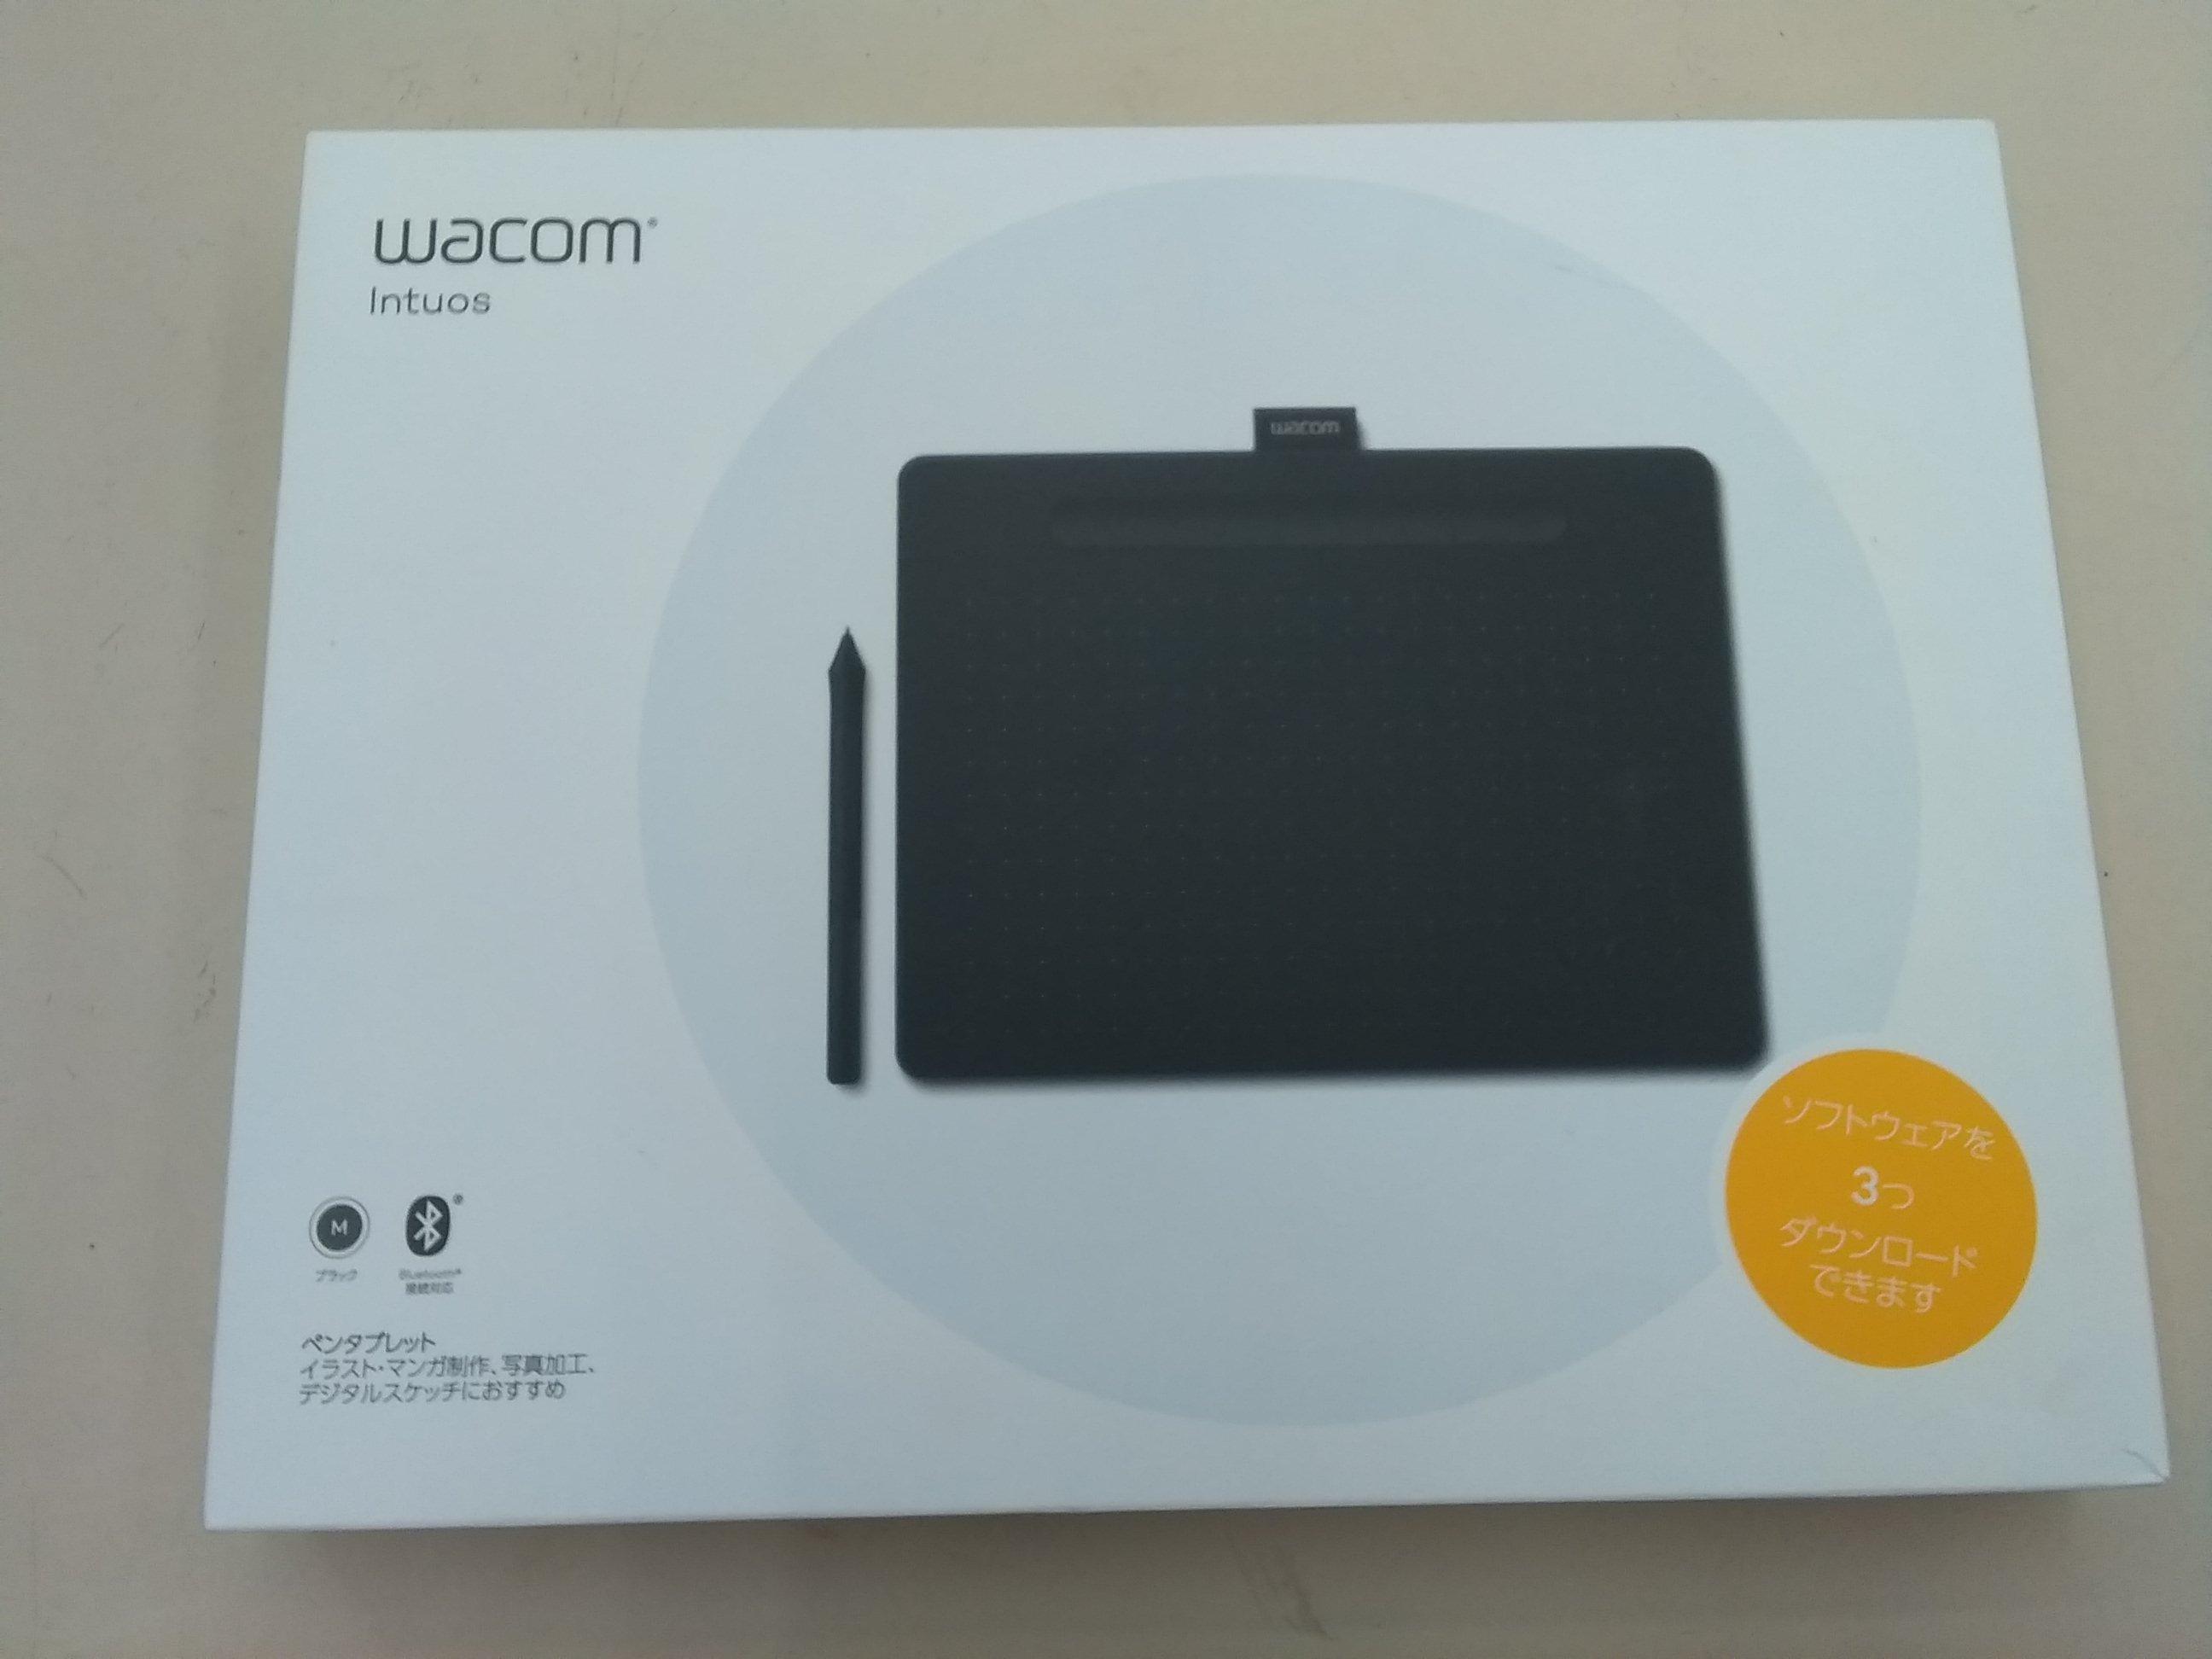 CTL-6100WL/K0 [Wacom Intuos Me|WACOM